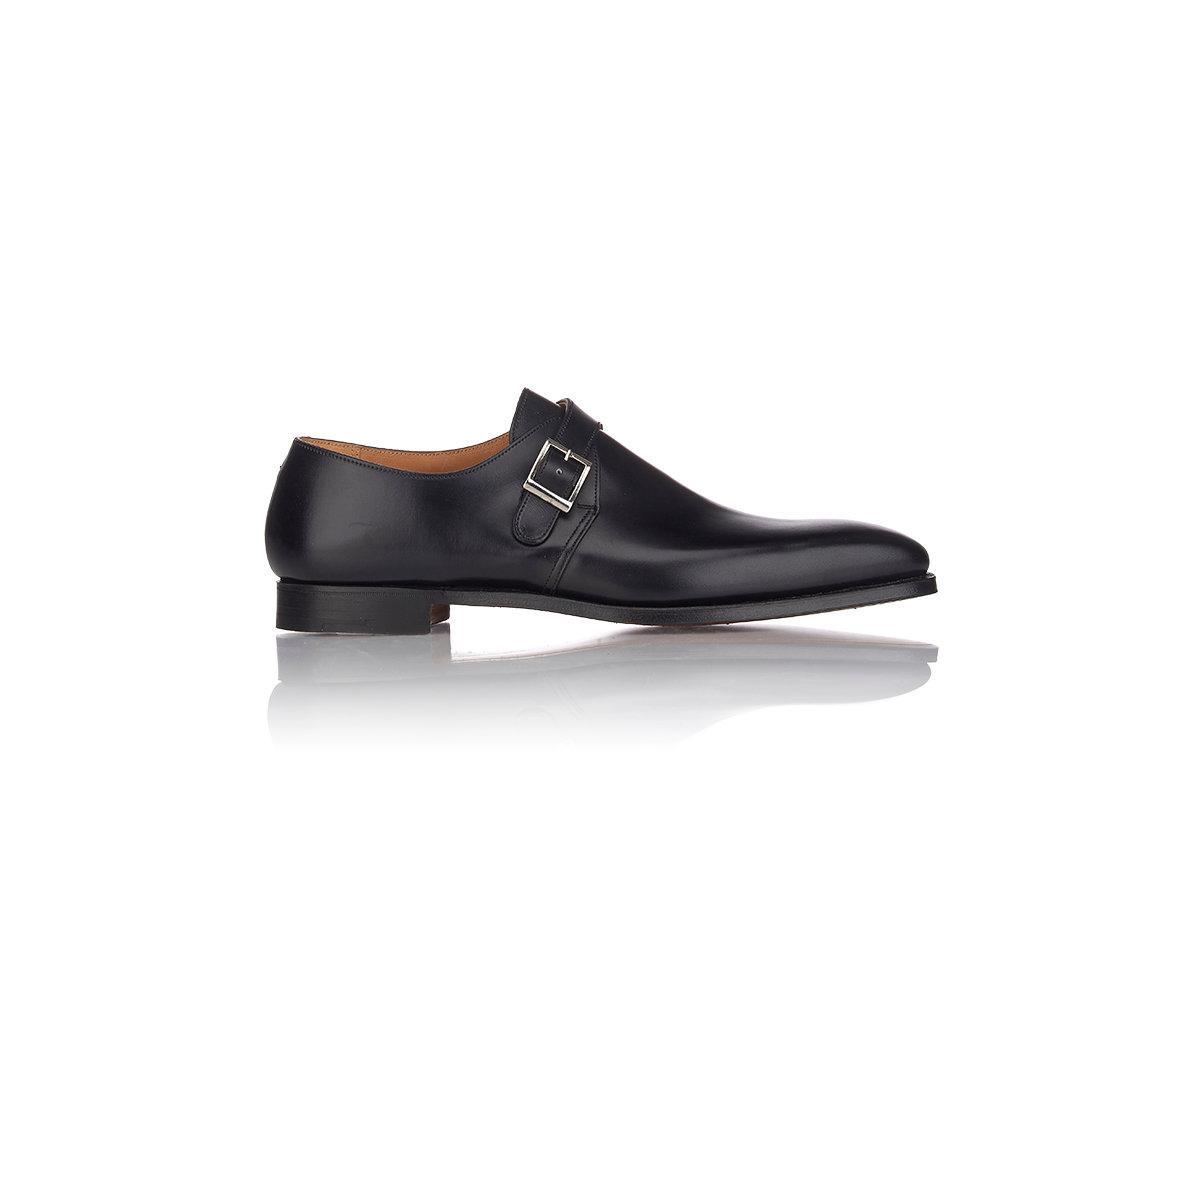 Mens Monkton Shoes Crockett & Jones lPxJbEn